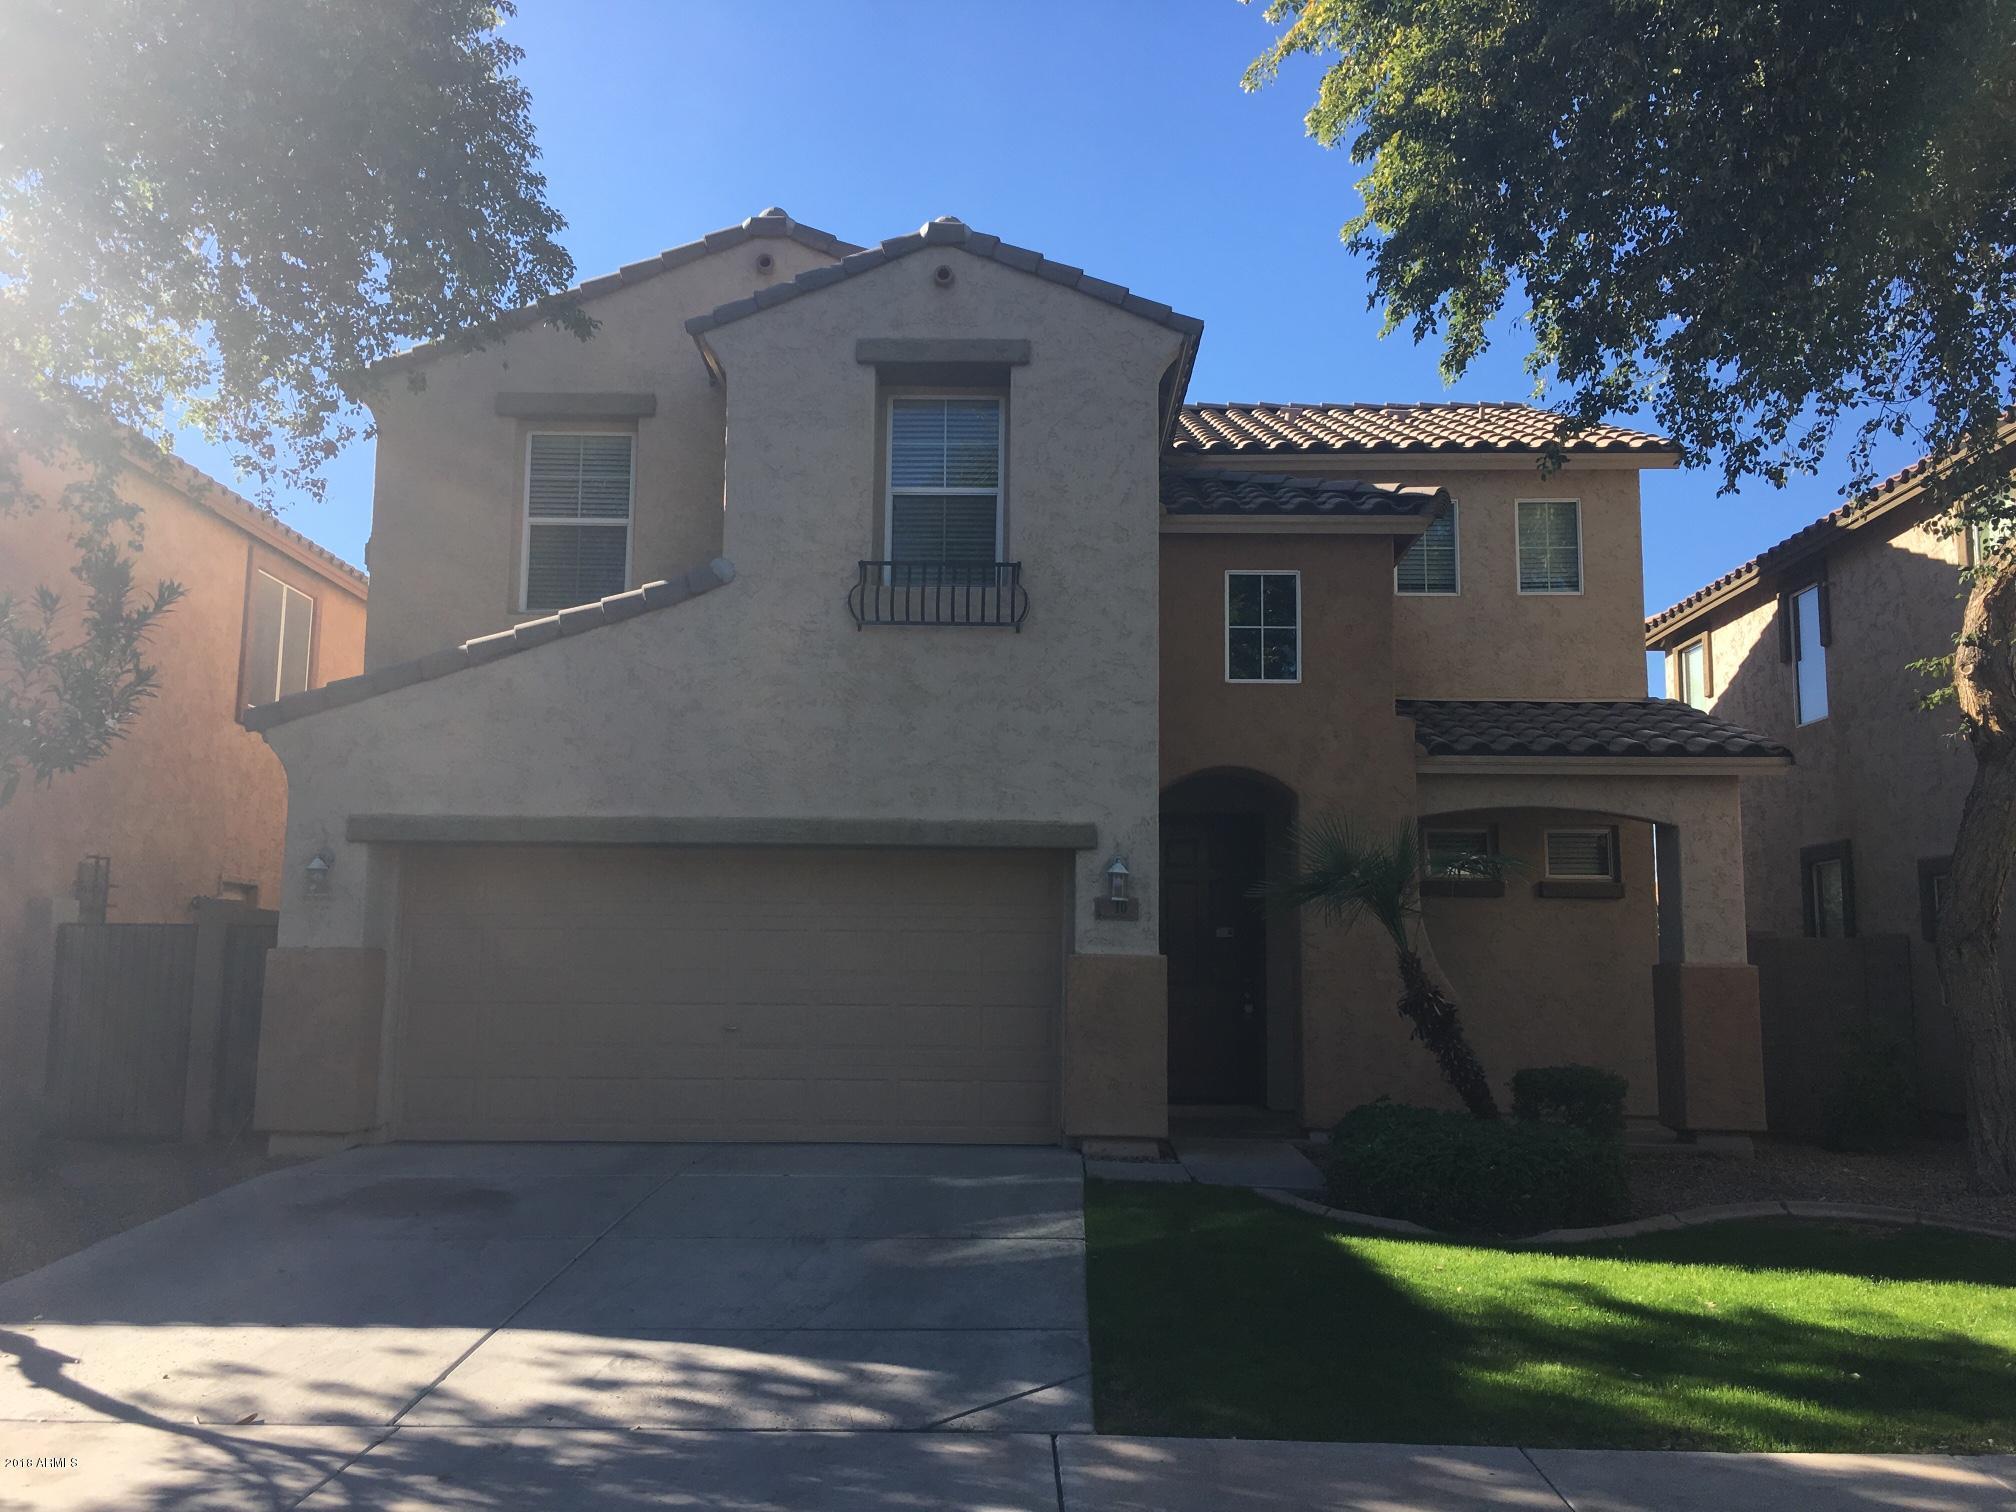 MLS 5854211 10 N 88TH Drive, Tolleson, AZ 85353